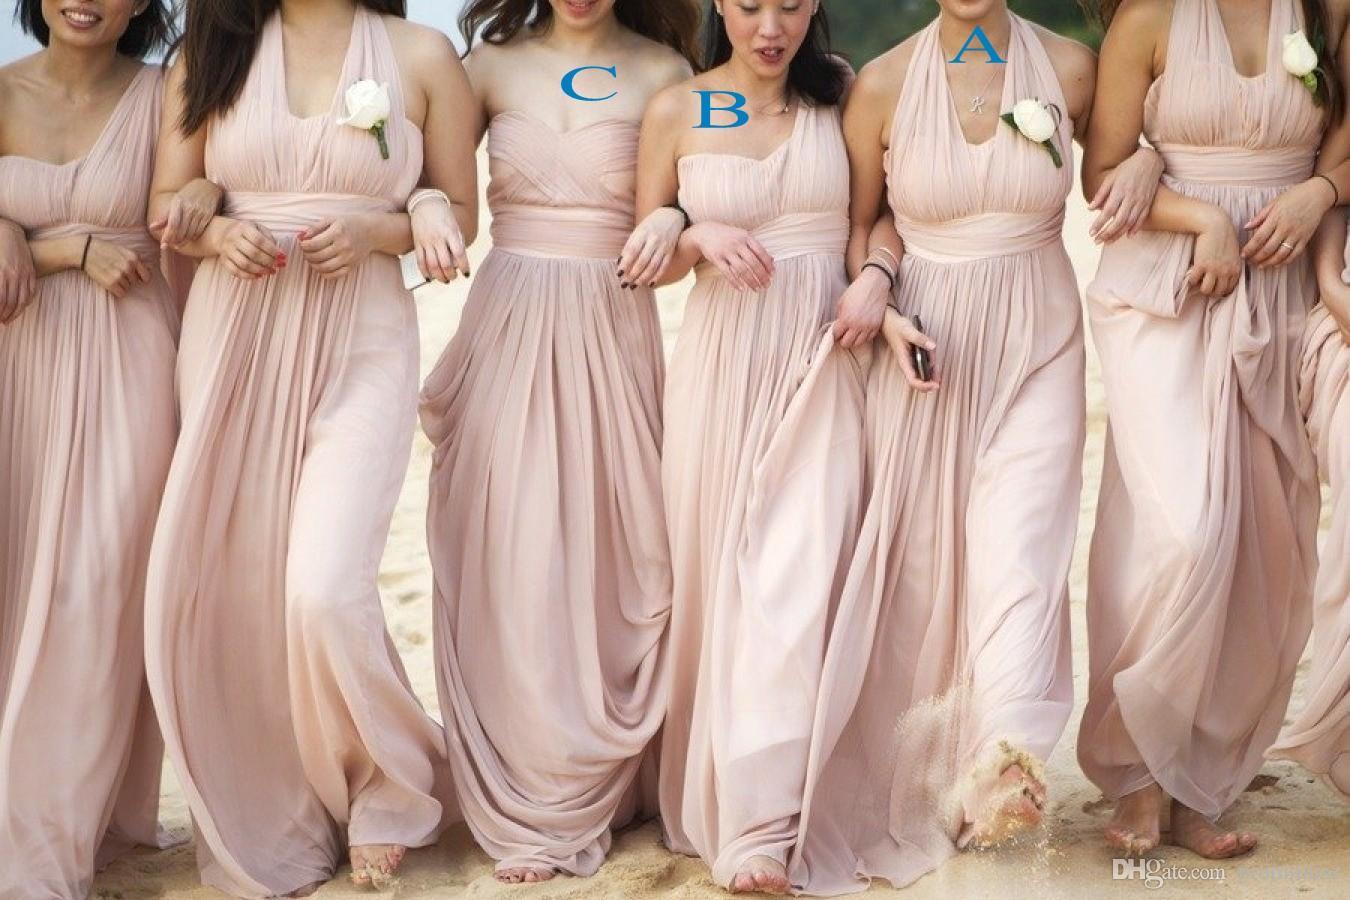 df8d814da4cf2 ... 2018 Nude Blush Bridesmaid Dresses Different Styles Chiffon A Line Bridesmaid  Gowns Ruffles Floor Length Beach ...